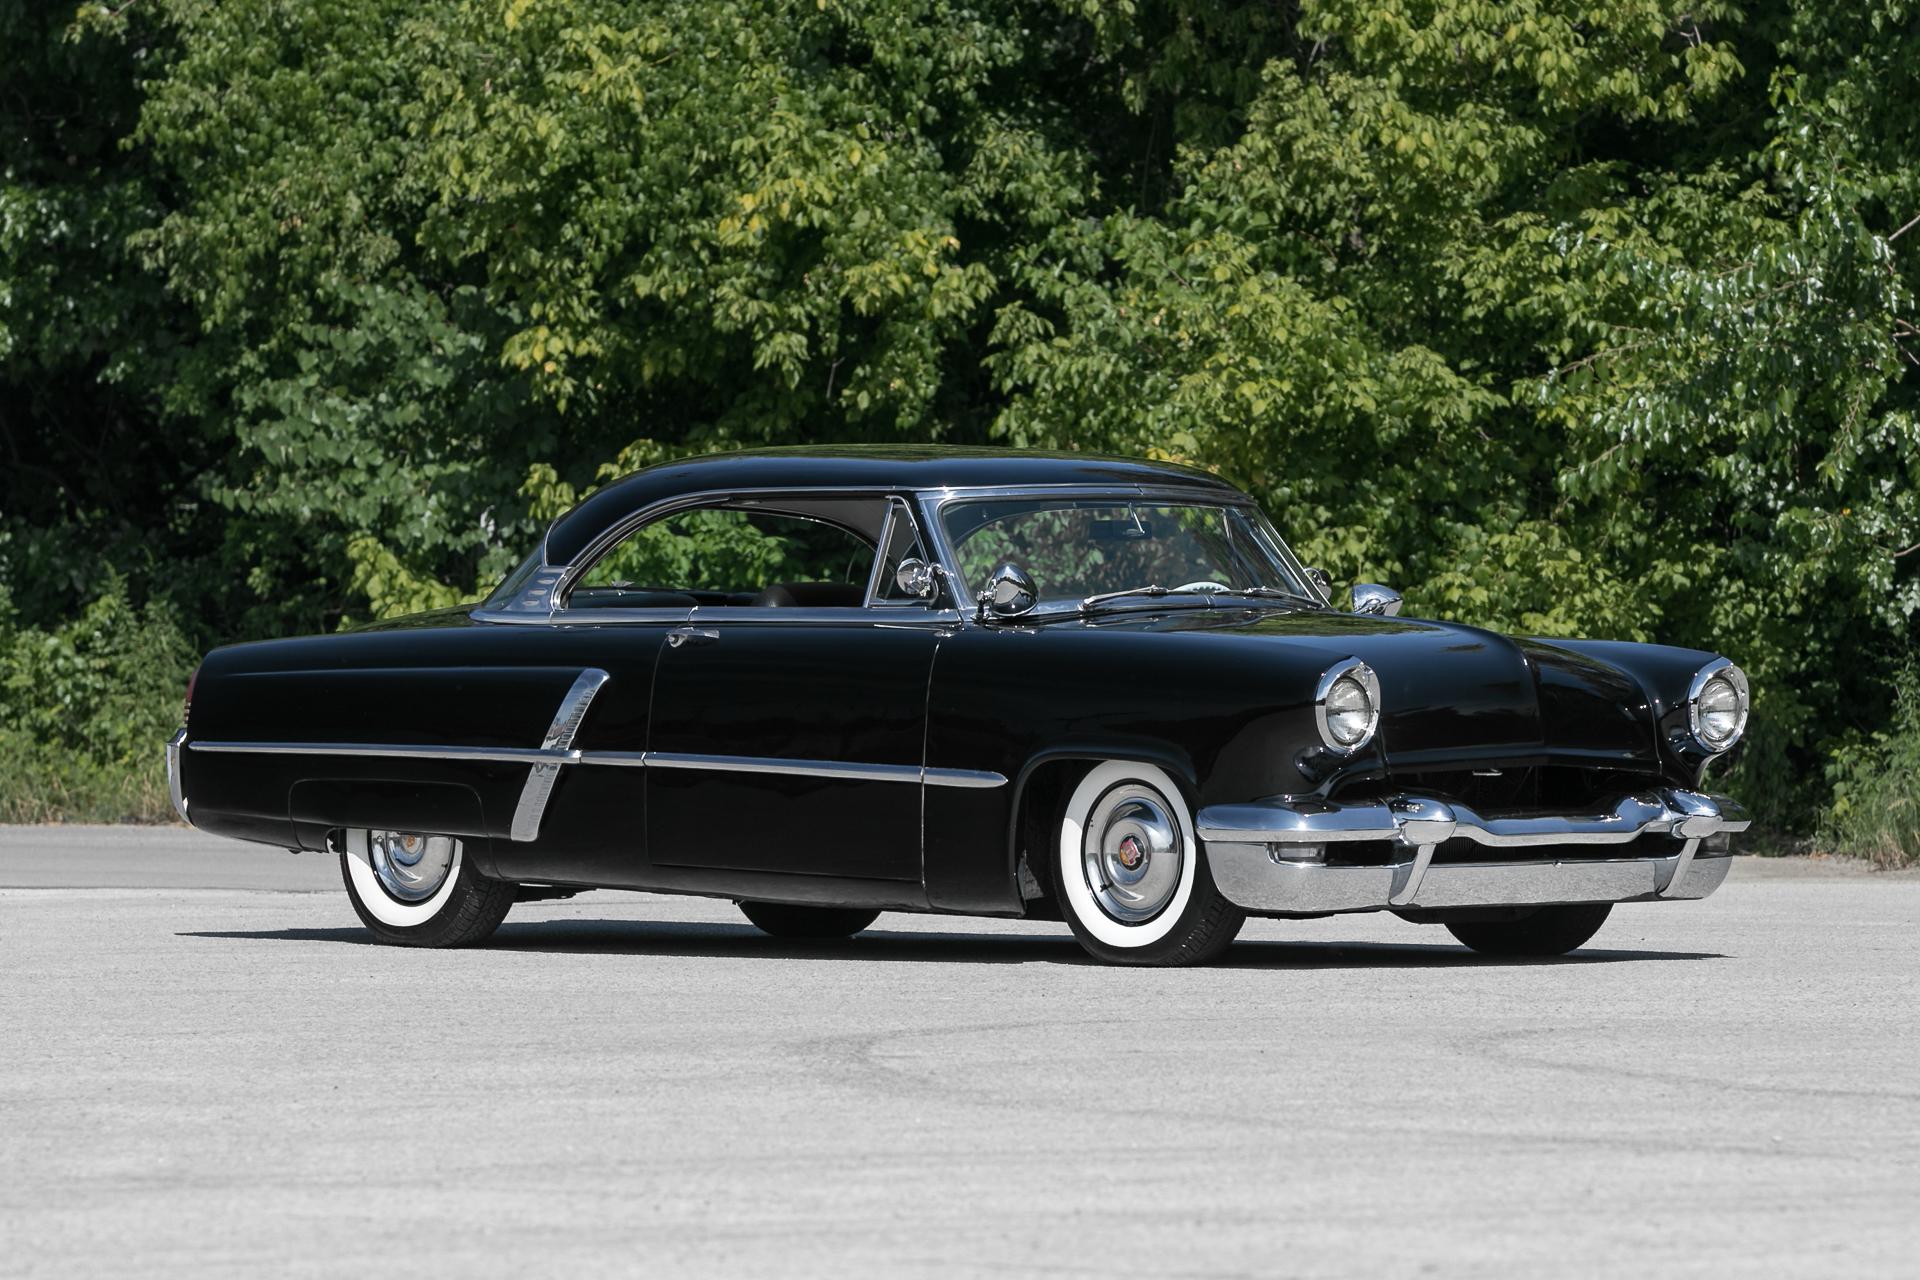 1953 Lincoln Capri Fast Lane Classic Cars Pontiac Grand Prix